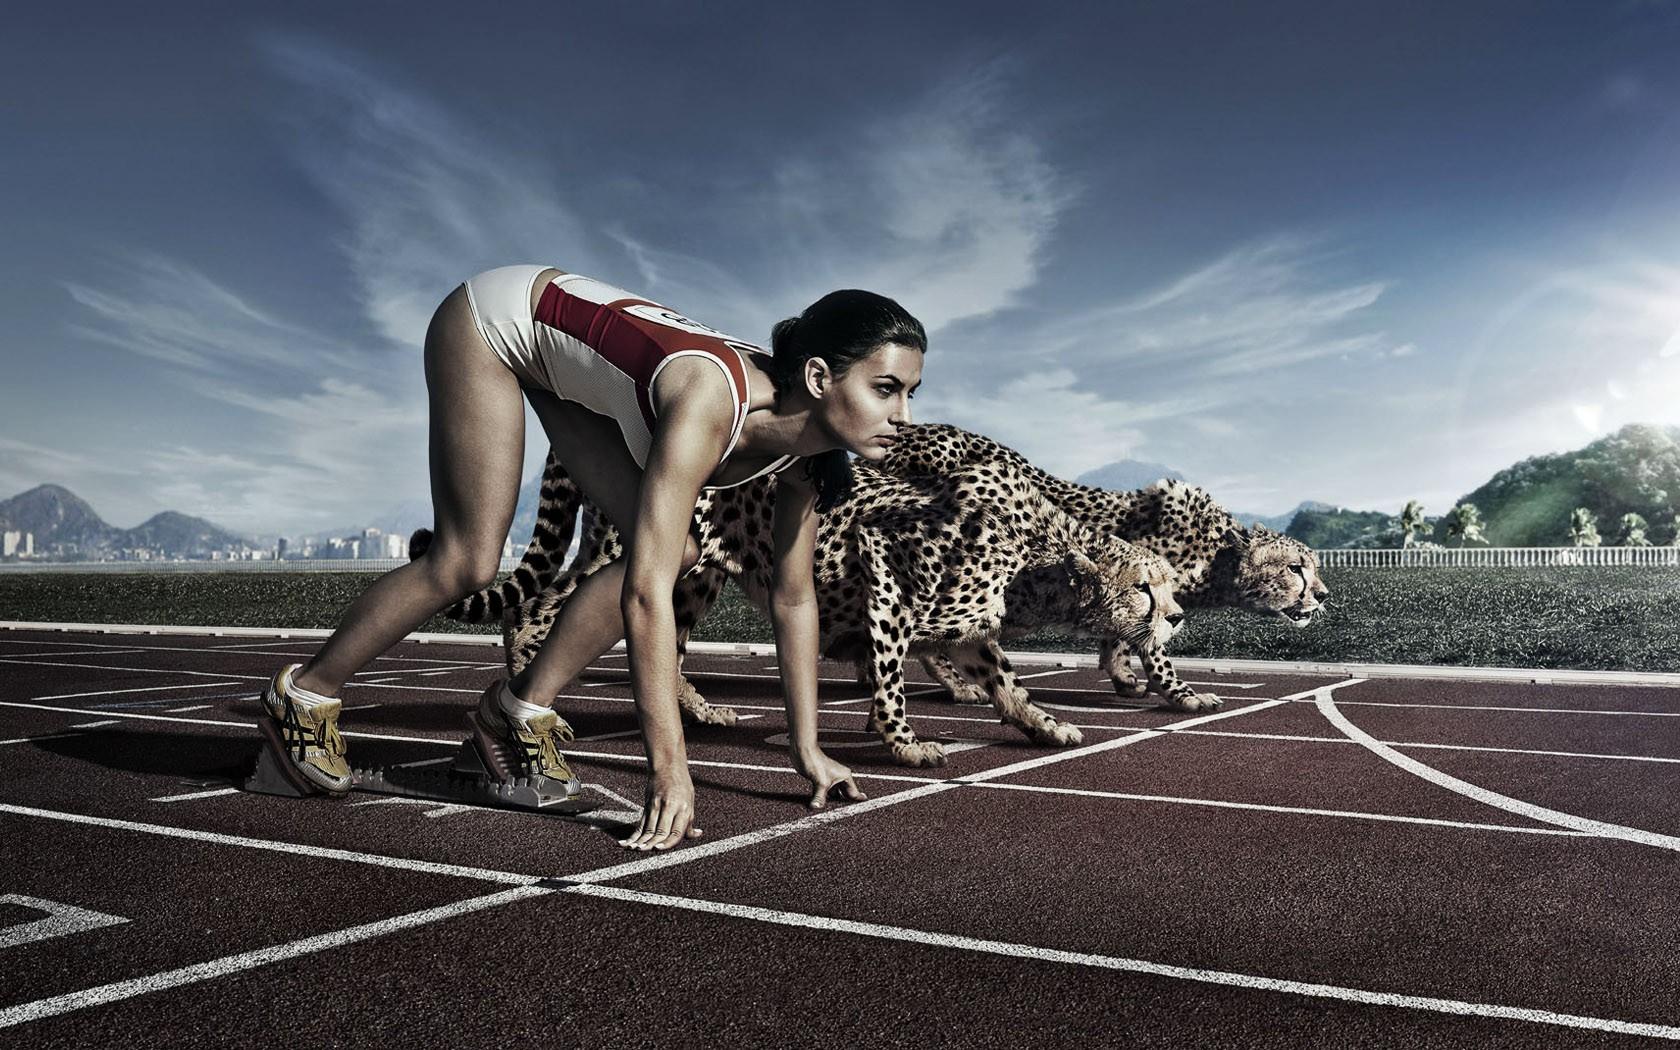 sport-nike-panther-girl-run-aligned-athletics-hd-wallpaper_1419341829